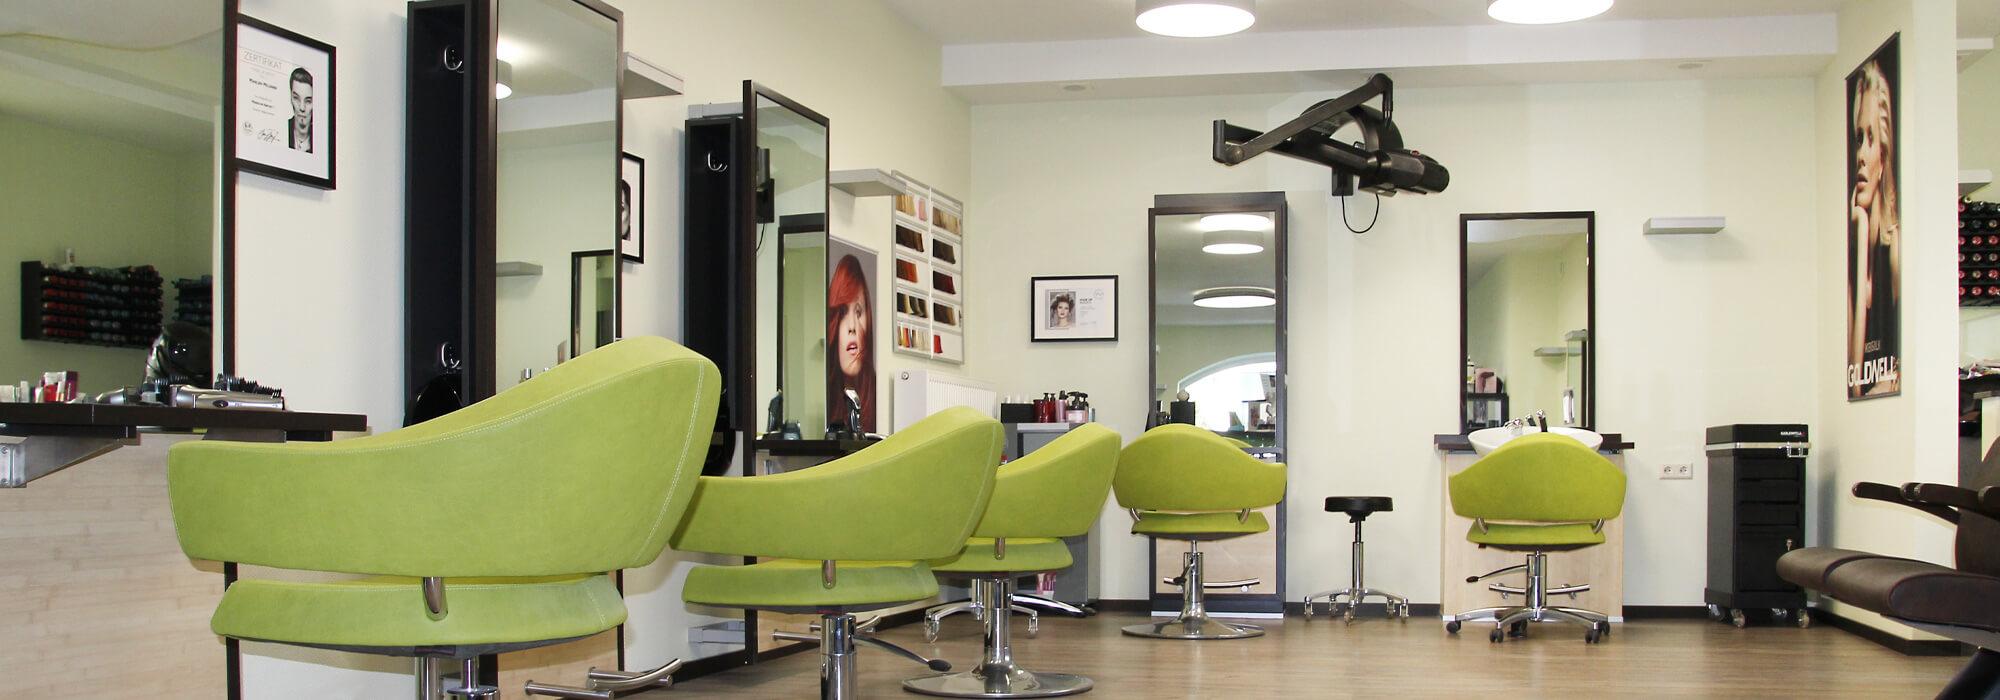 Salon in Elstra | Friseurstudio AtmospHair